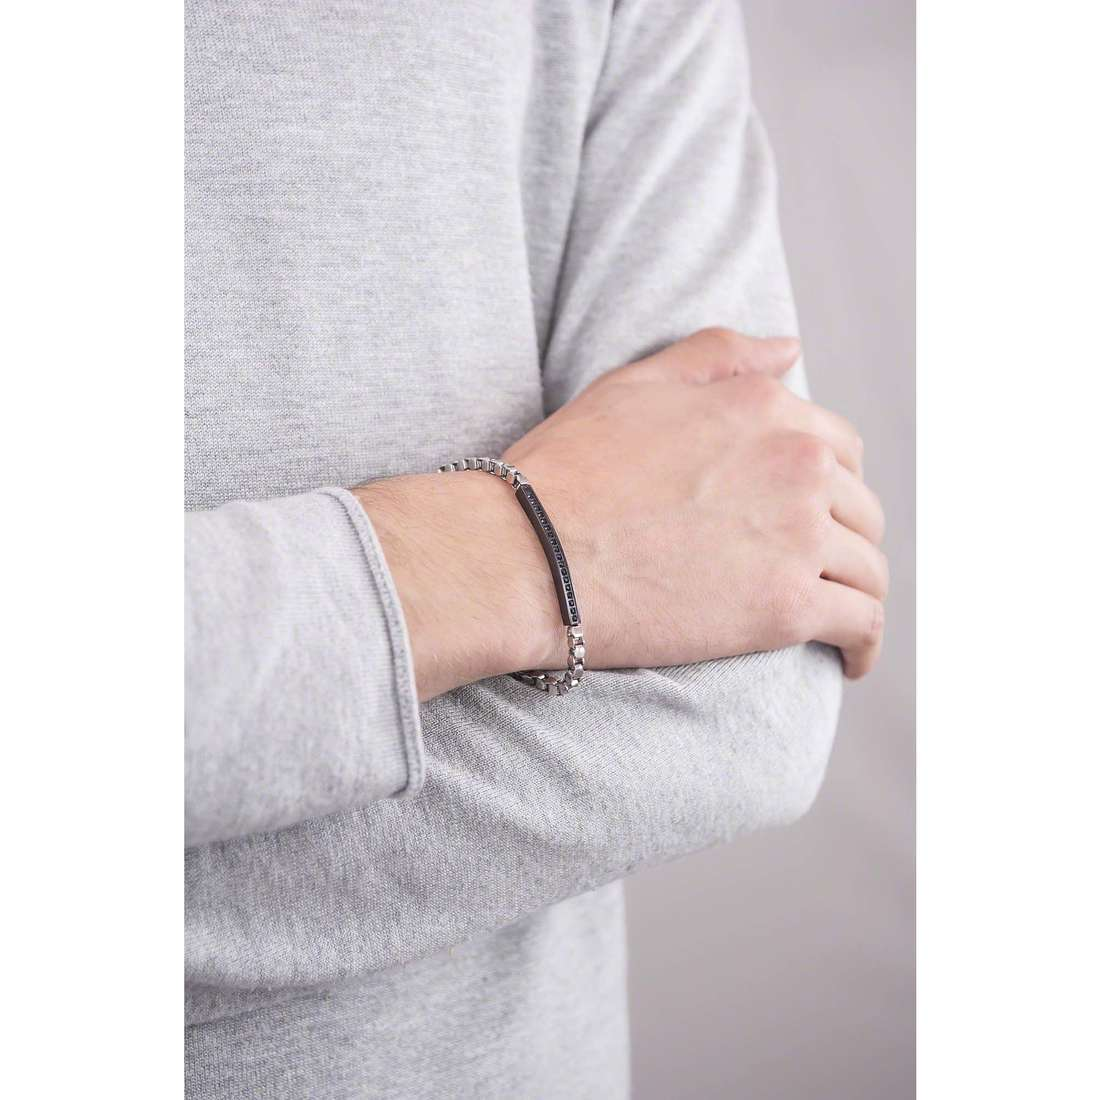 4US Cesare Paciotti bracelets Steel homme 4UBR1289 indosso